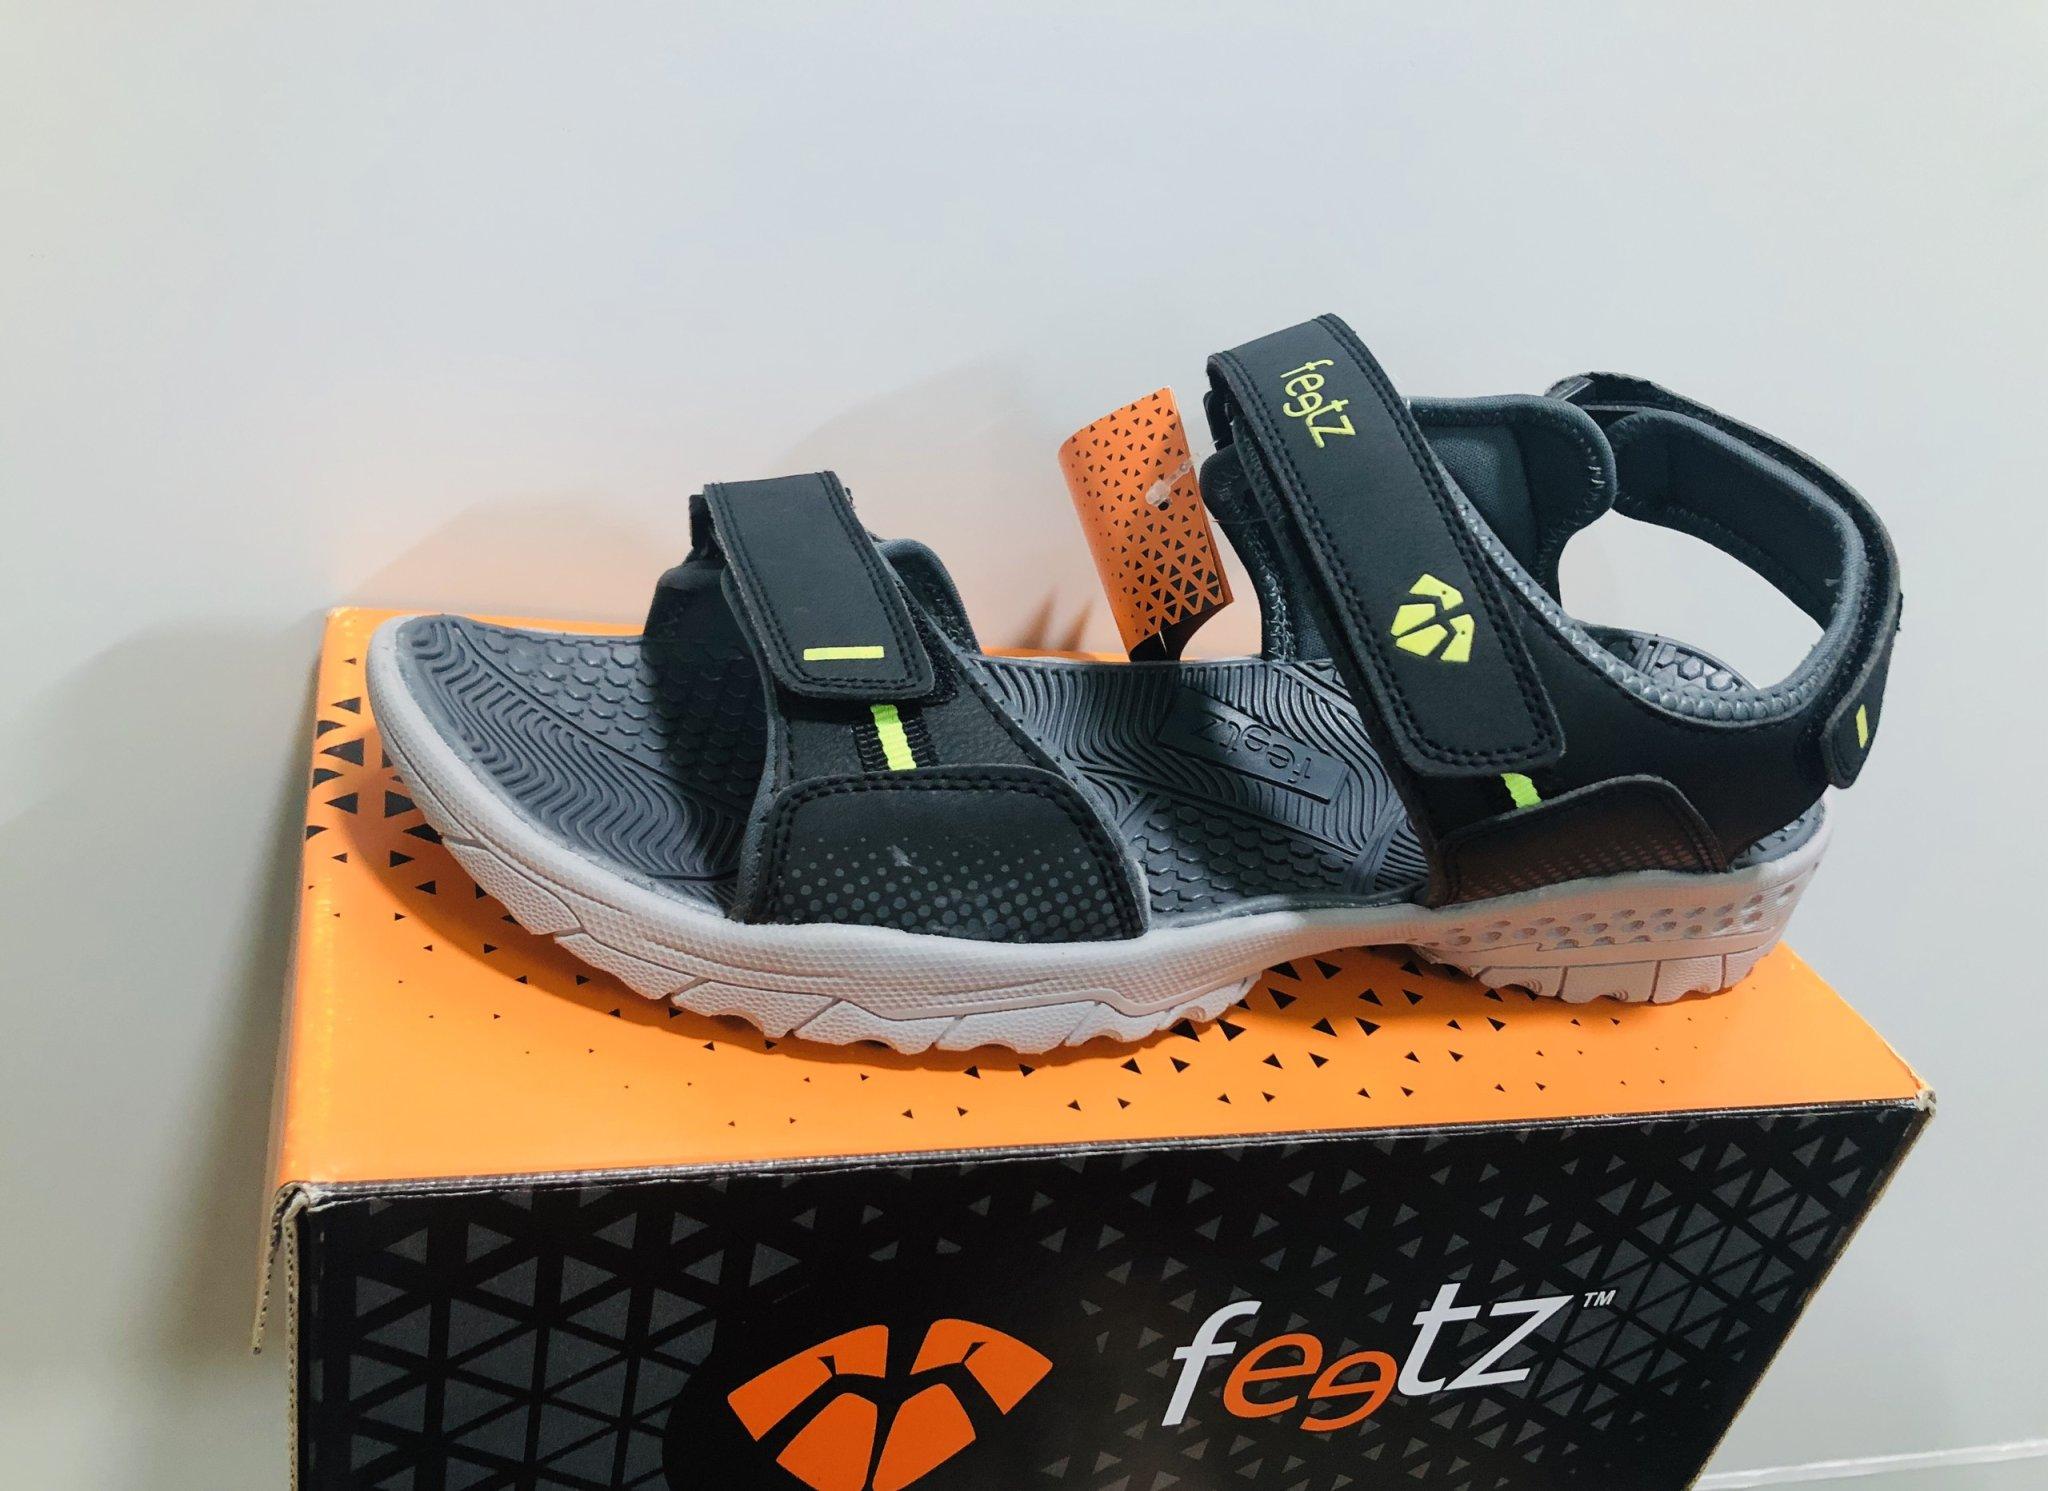 sandal ngoại cỡ tphcm